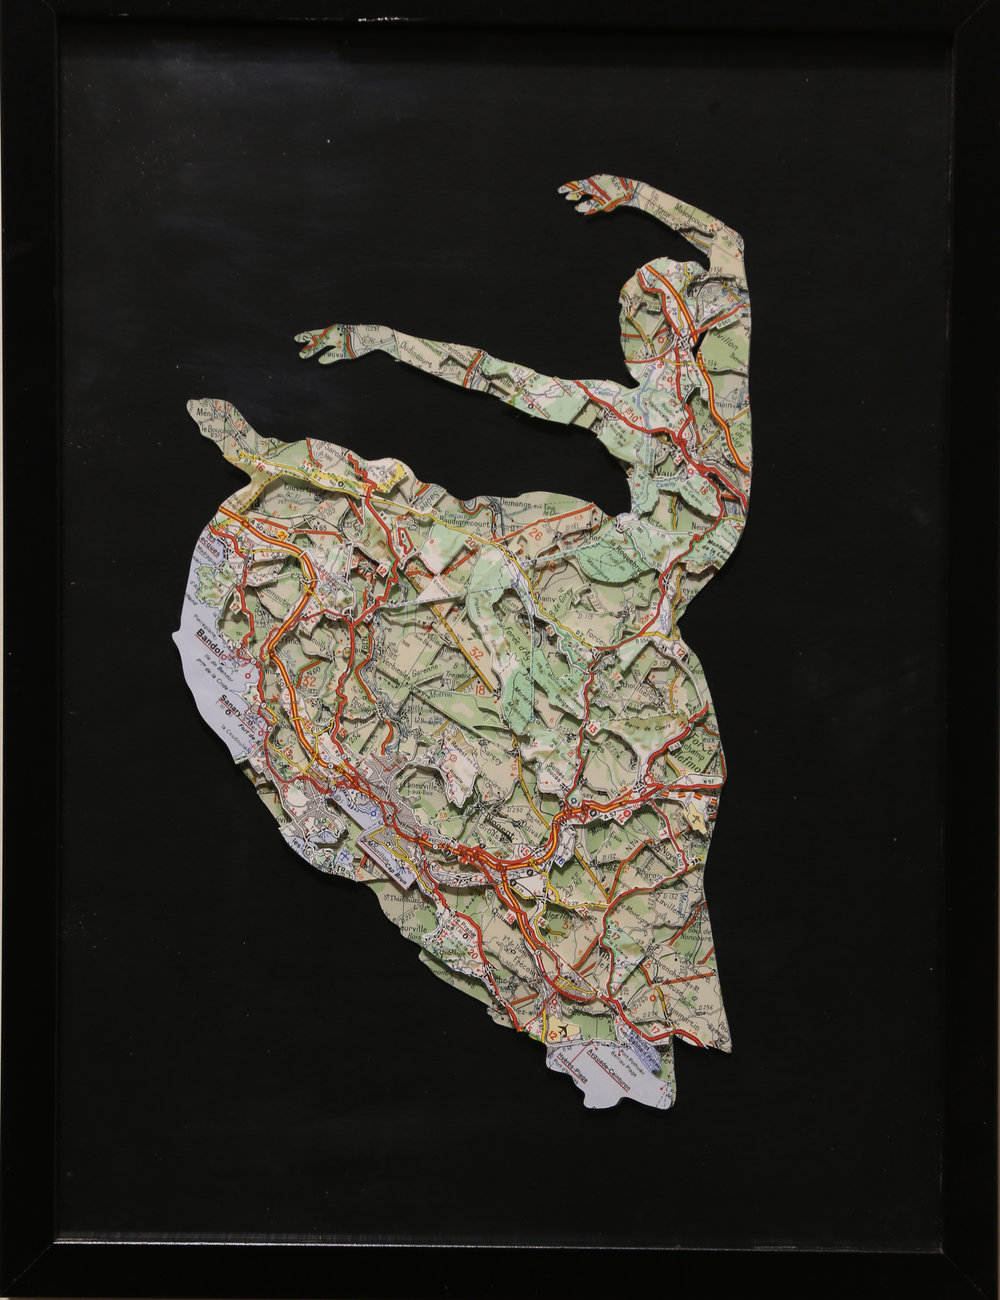 GalleryOonH-Joanthan Bessaci-Flamenco-2017-Michelin maps and glass-.JPG